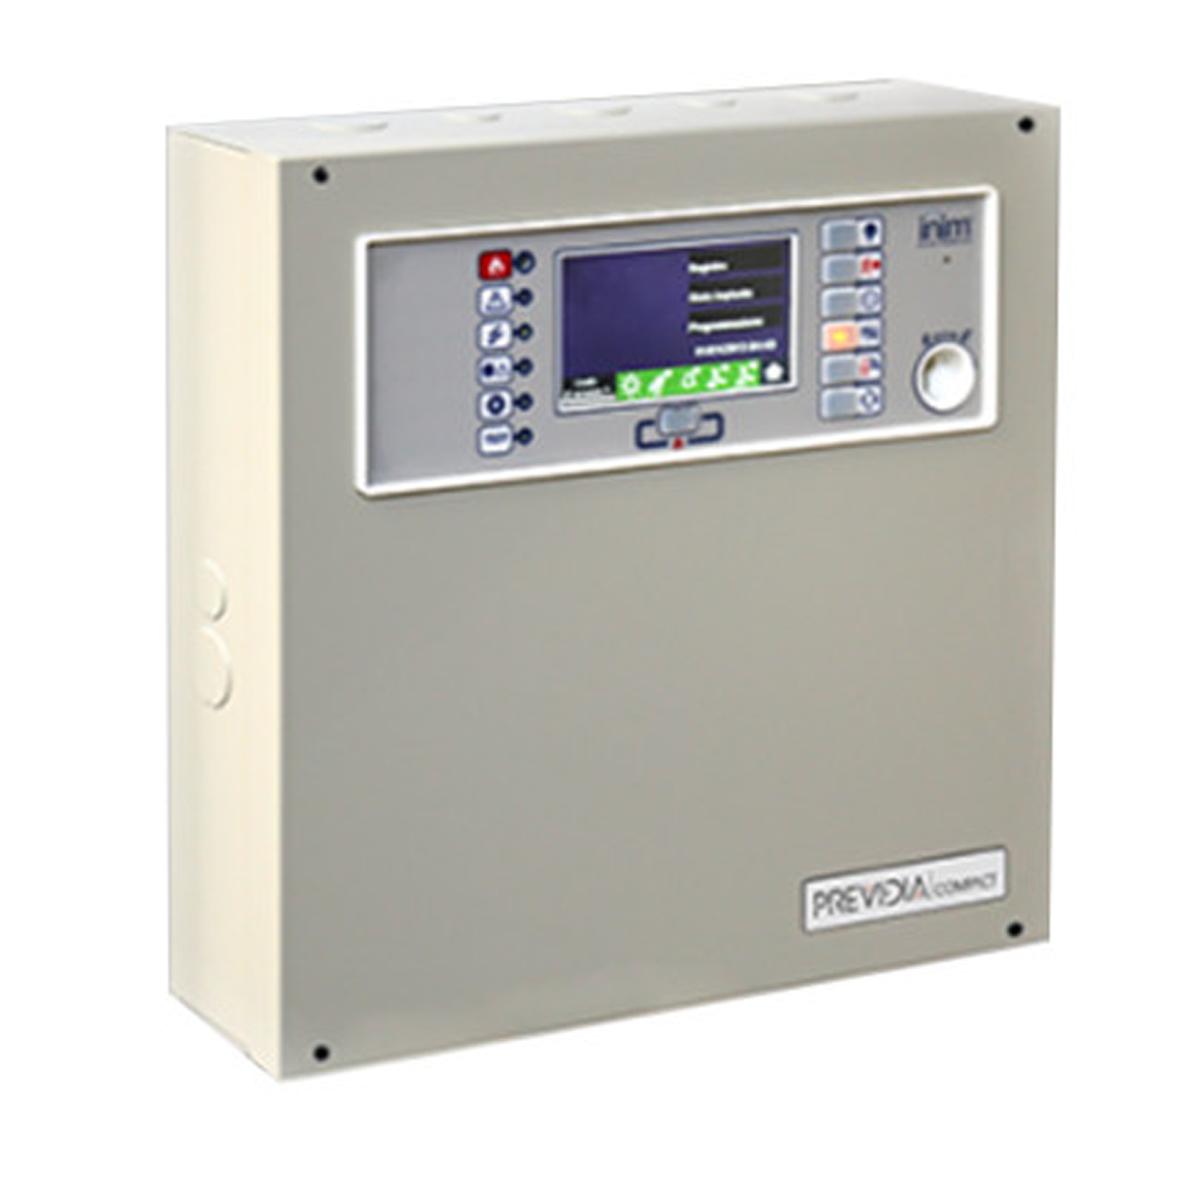 PREVIDIA Compact 1 Loop C050SG